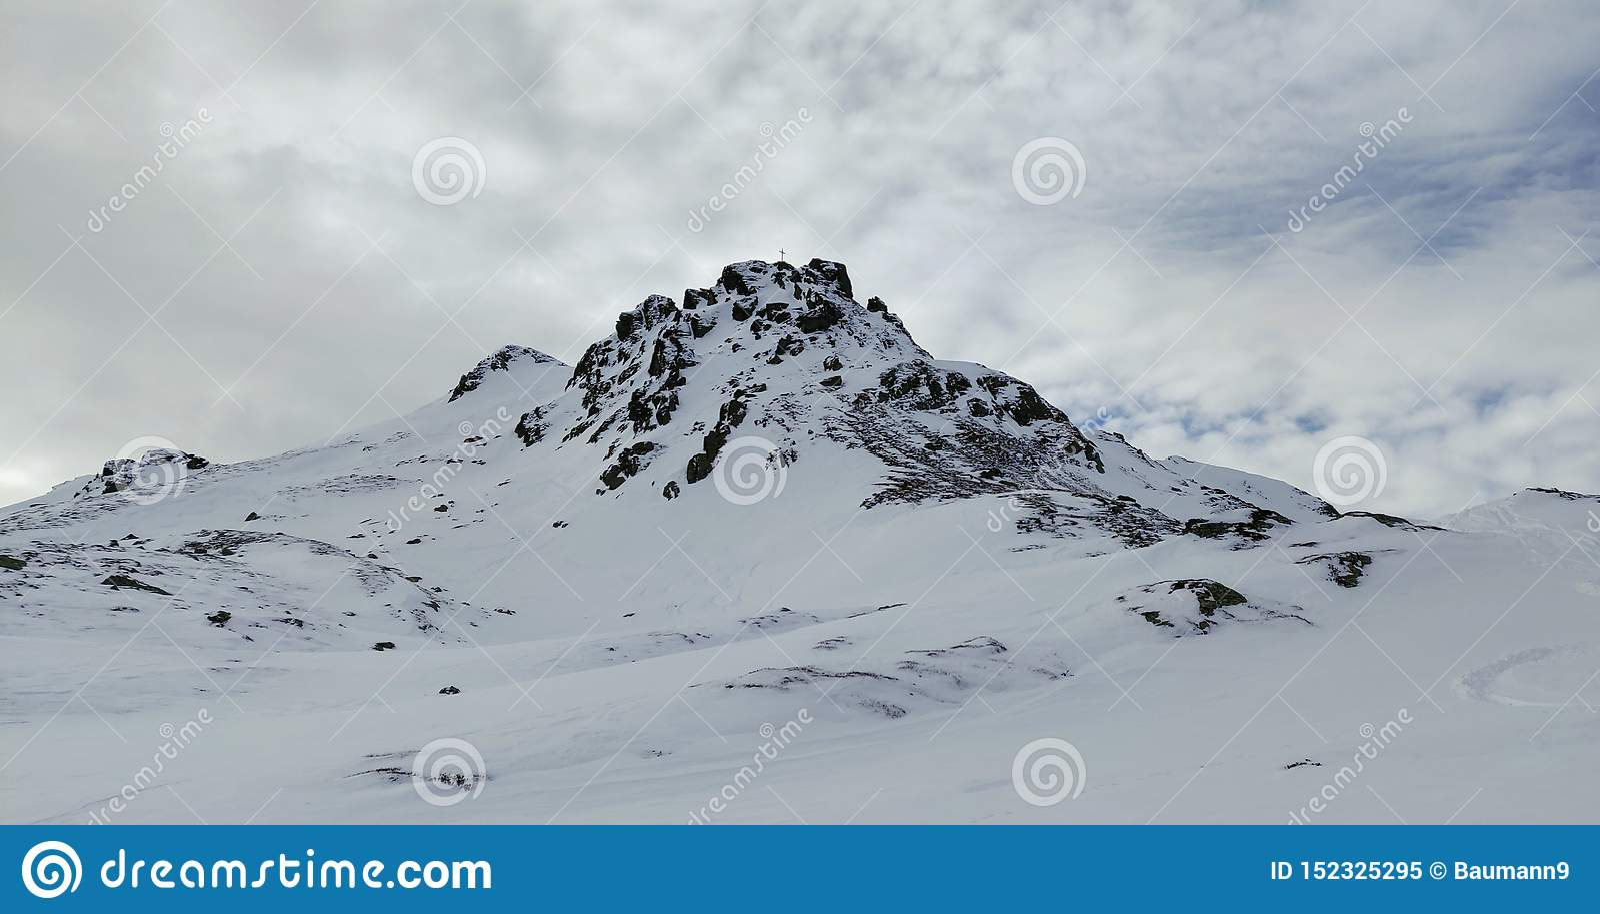 Mountaineering in Tirol